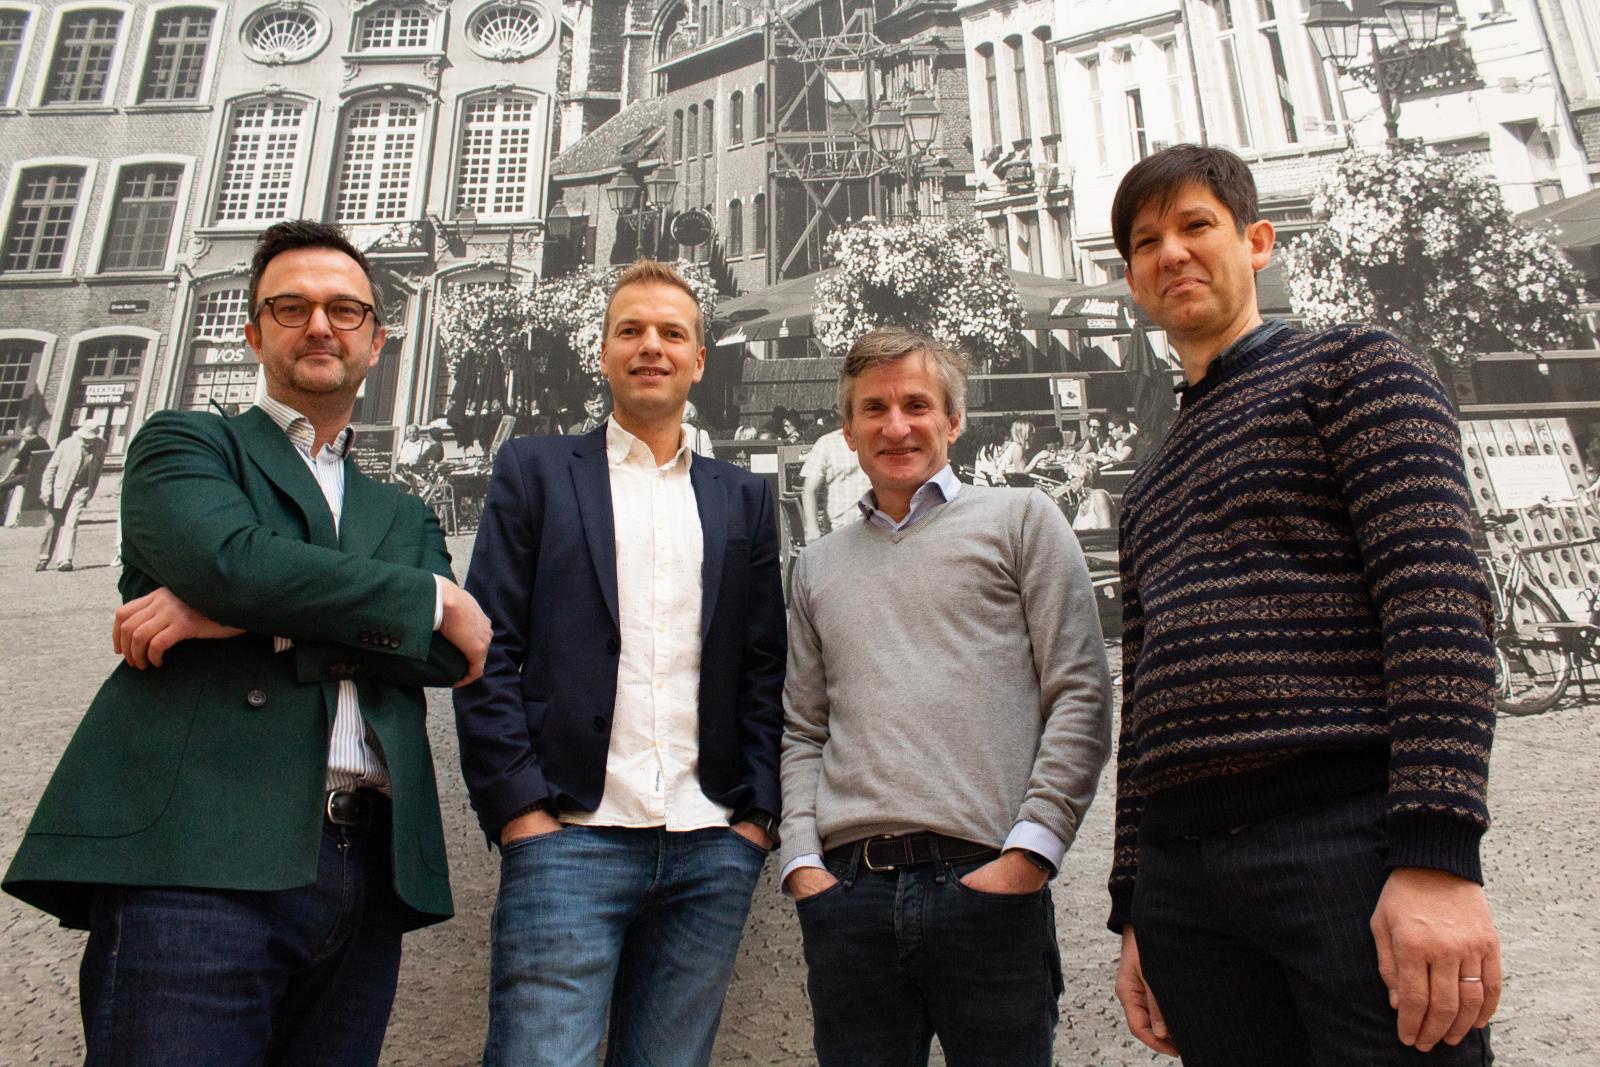 Jan Govaerts – Partner bij theMatchBox.be, Mark Willems – CEO Jellow België, Noel Wilson – CEO Jellow, Joeri Mesens – CTO bij theMatchBox.be